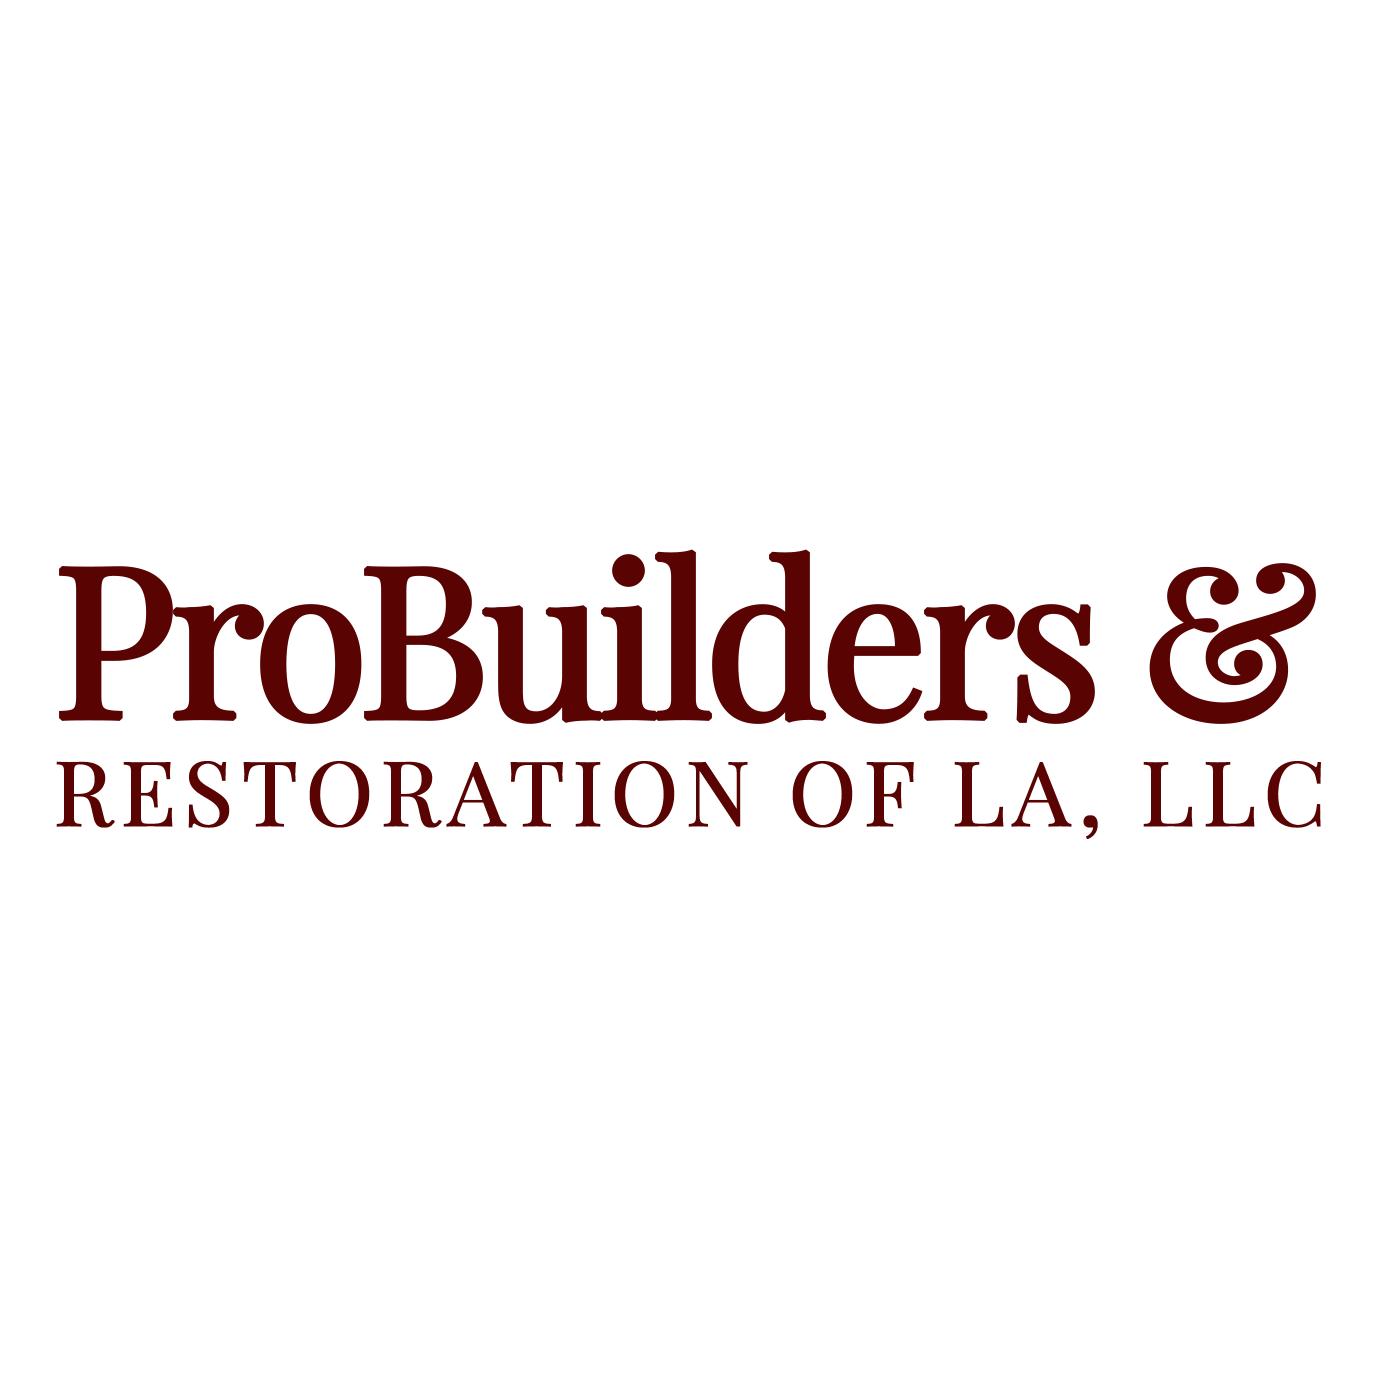 ProBuilders & Restoration of LA, LLC